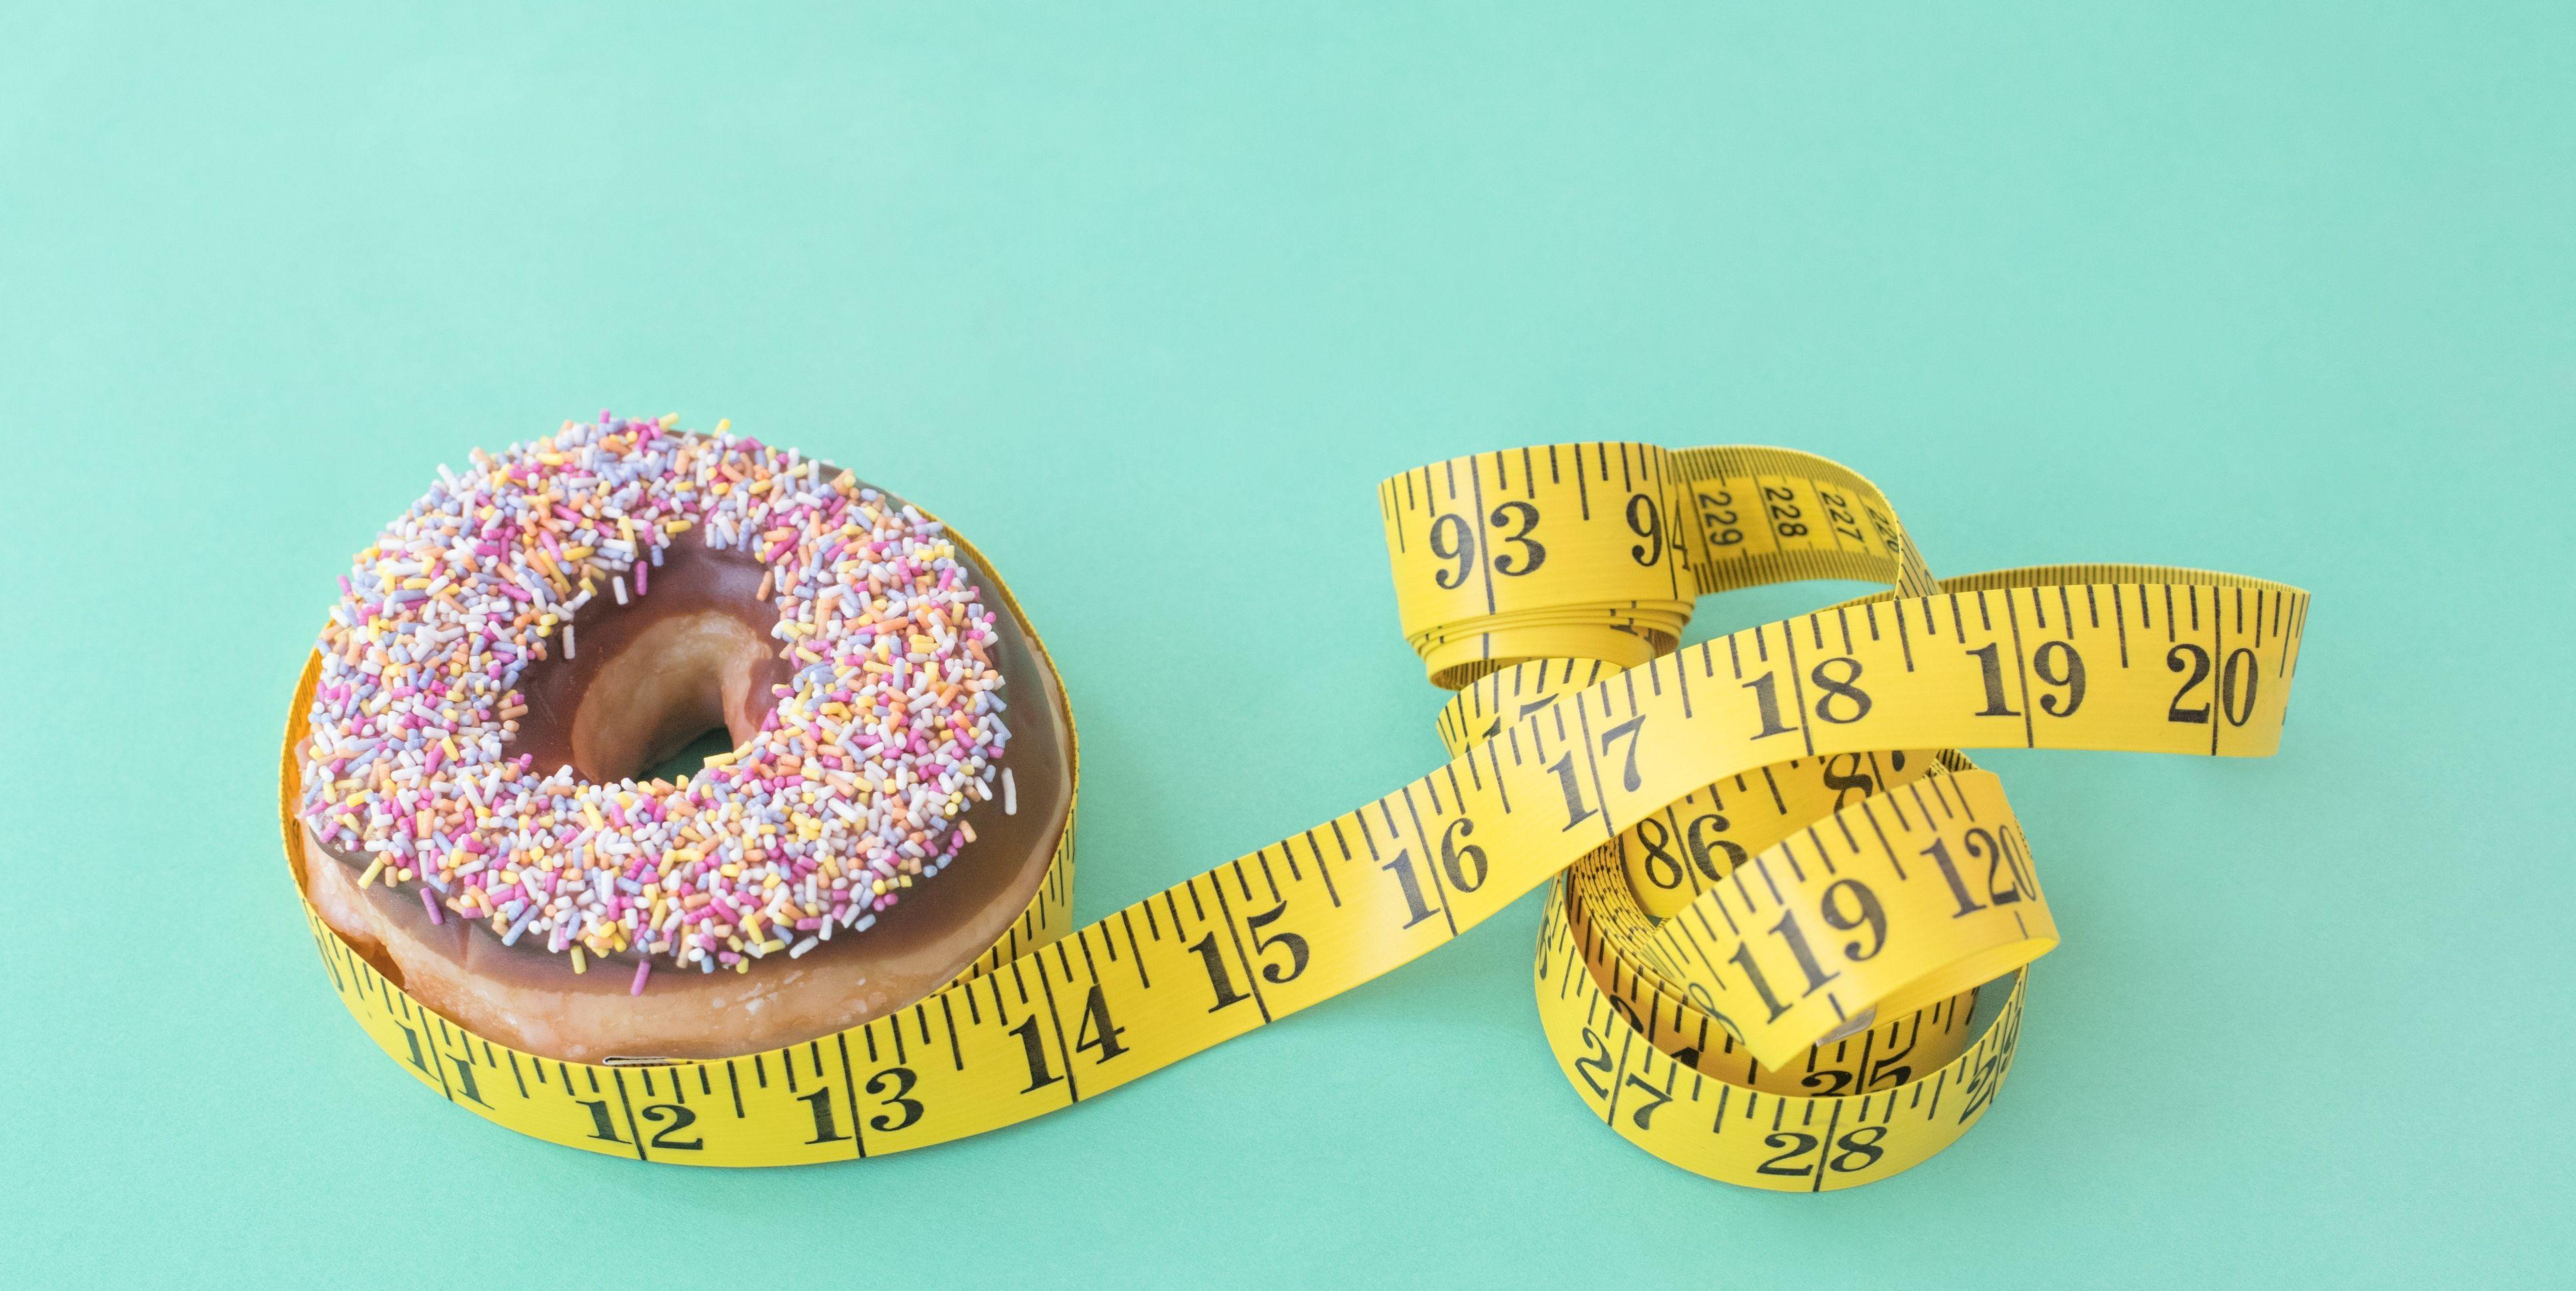 Doughnut and tape measure